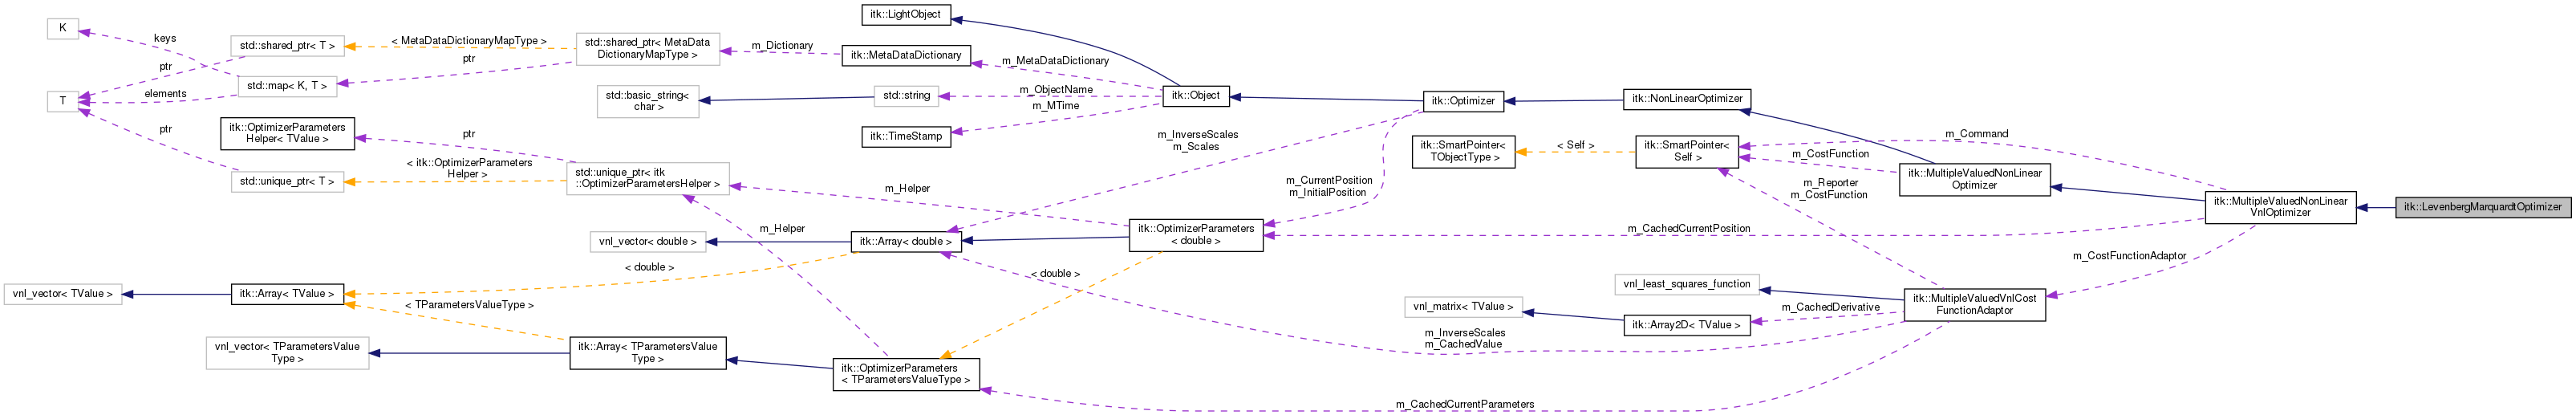 ITK: itk::LevenbergMarquardtOptimizer Class Reference